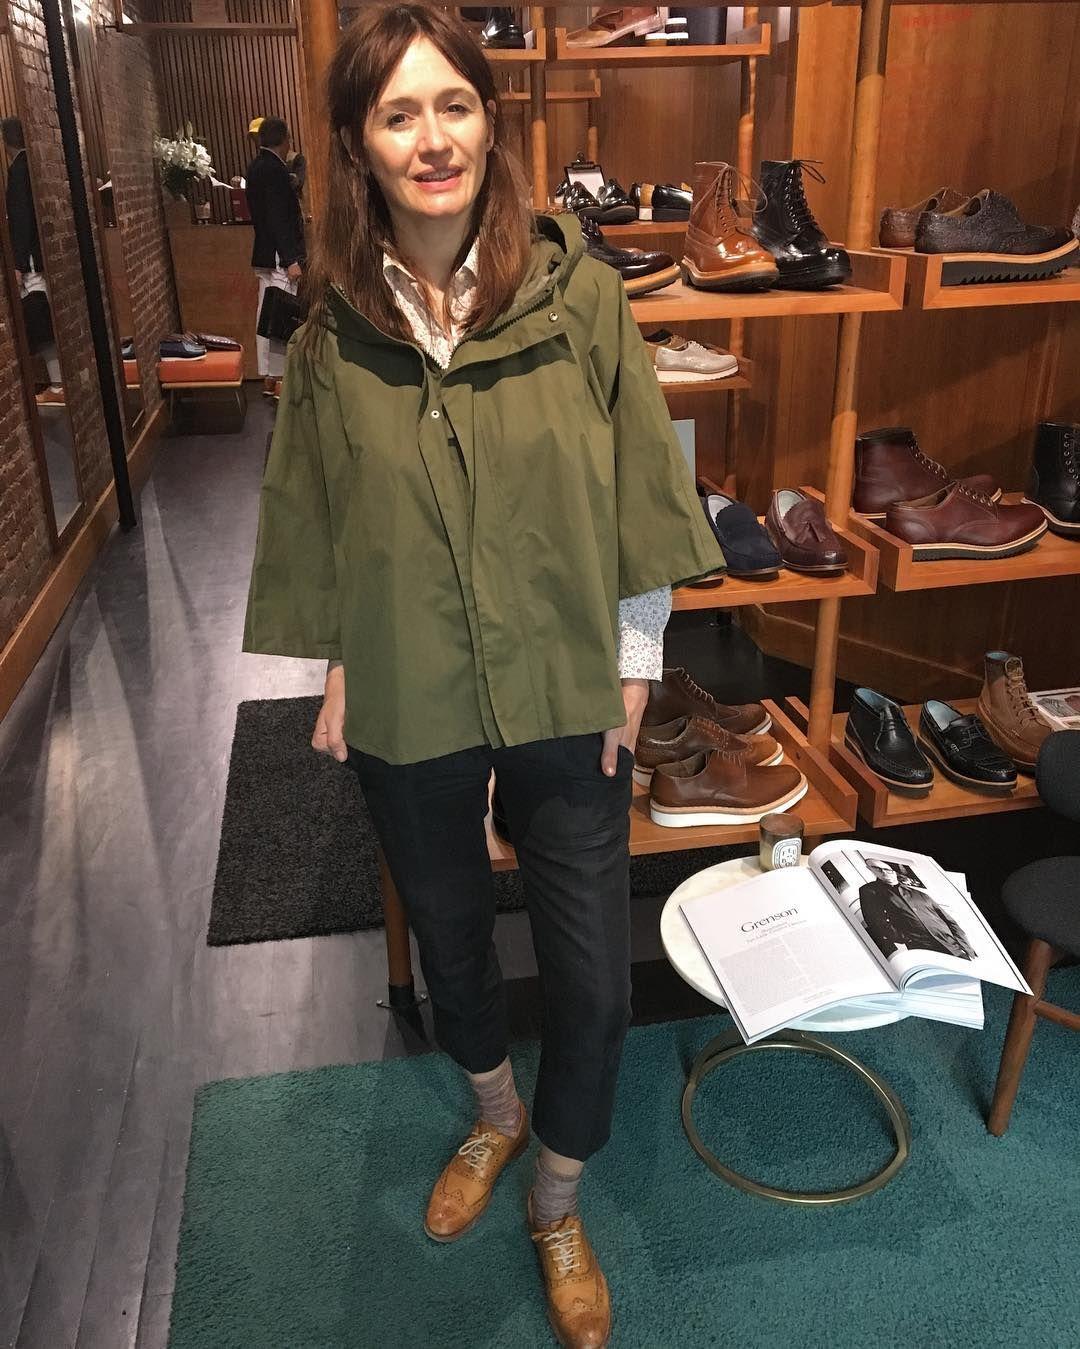 Emily Mortimer Emortimer In Martha In Our Ny Store On Elizabeth Street